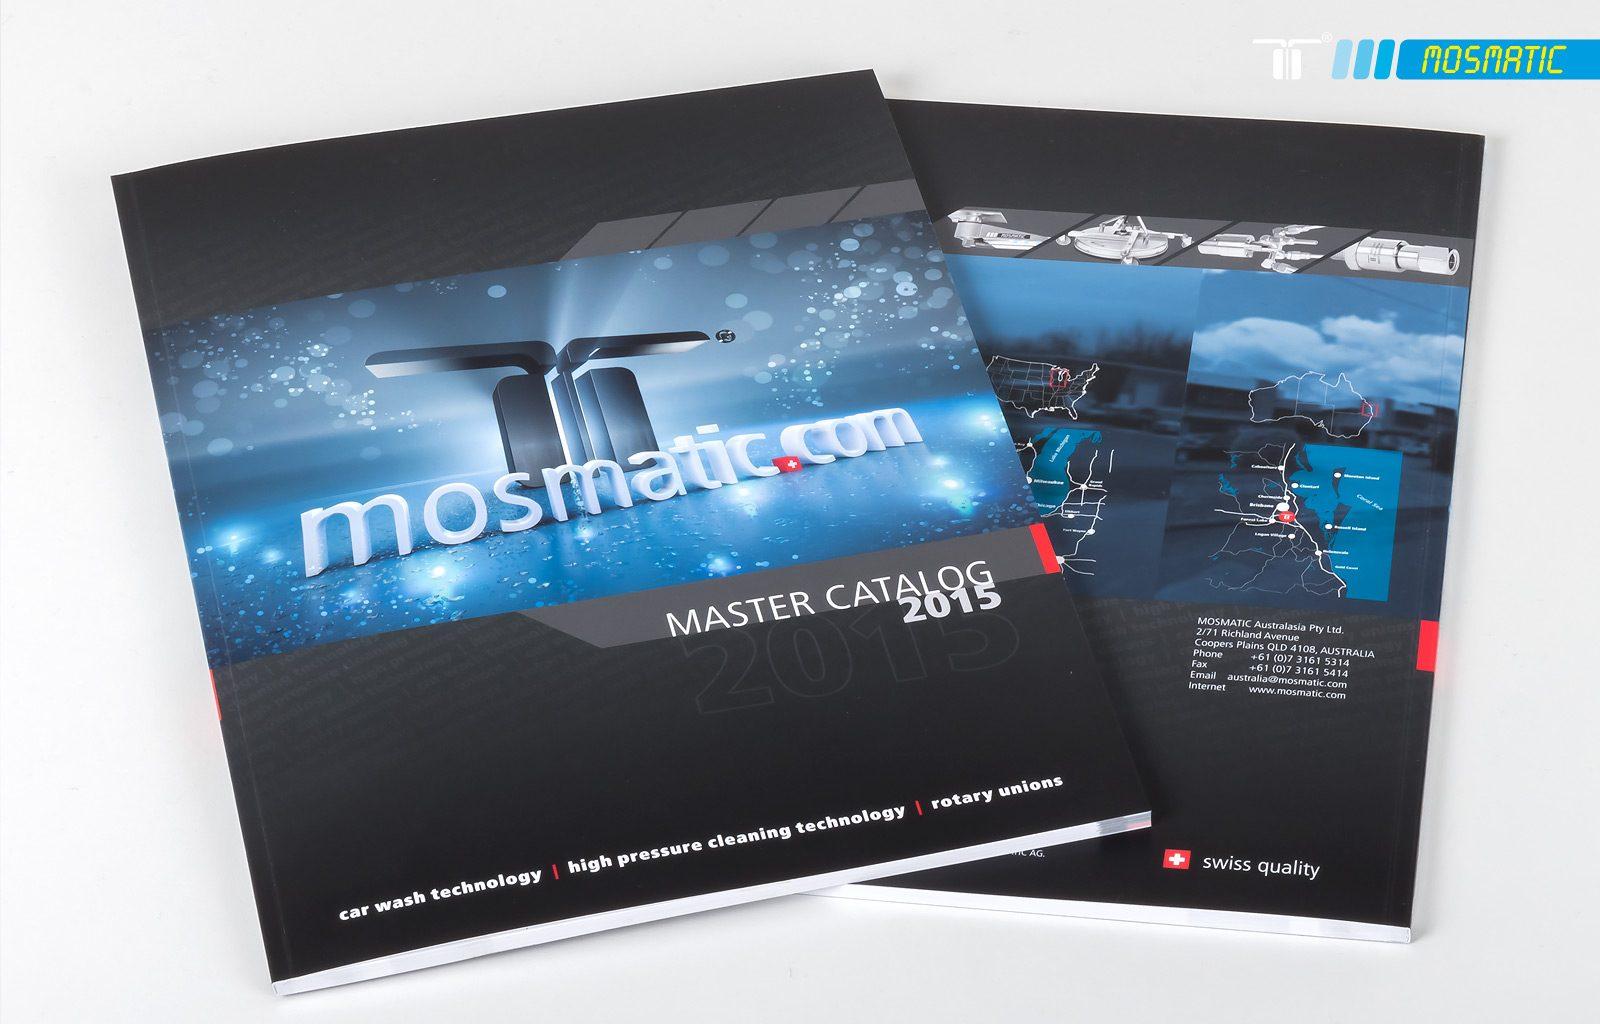 Master Catalog 2015